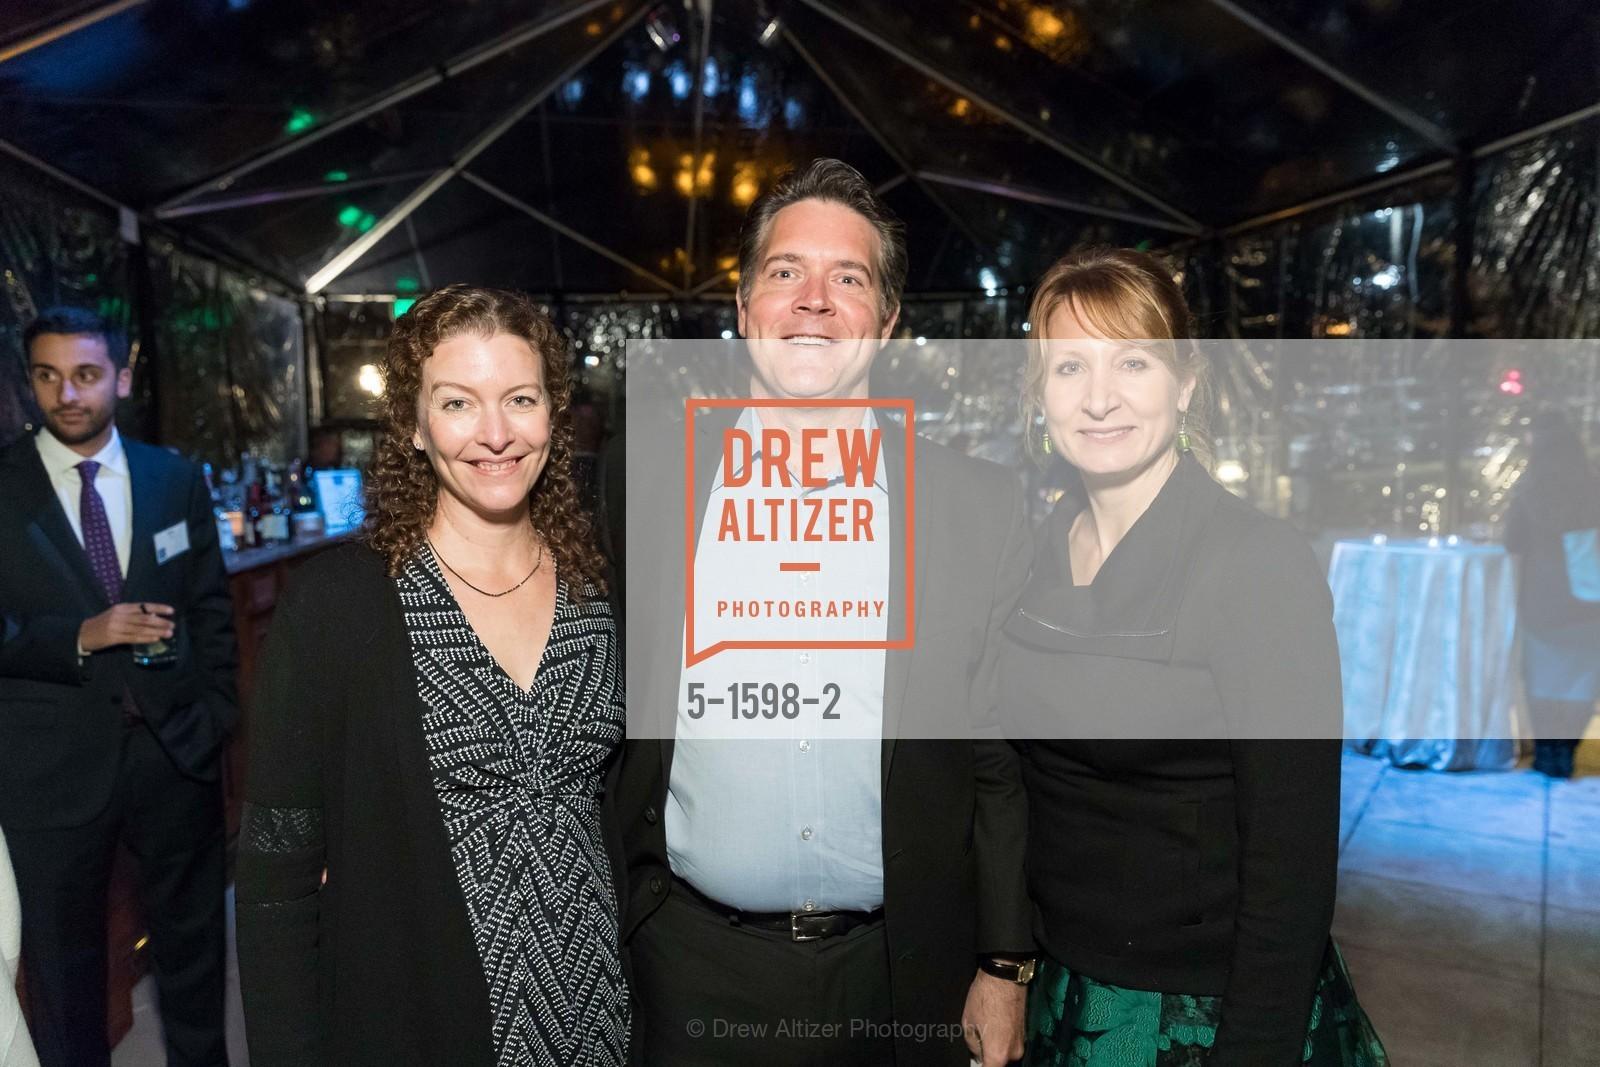 Mimi Searfoss, Fred Falsetti, Beth van Schaack, Photo #5-1598-2